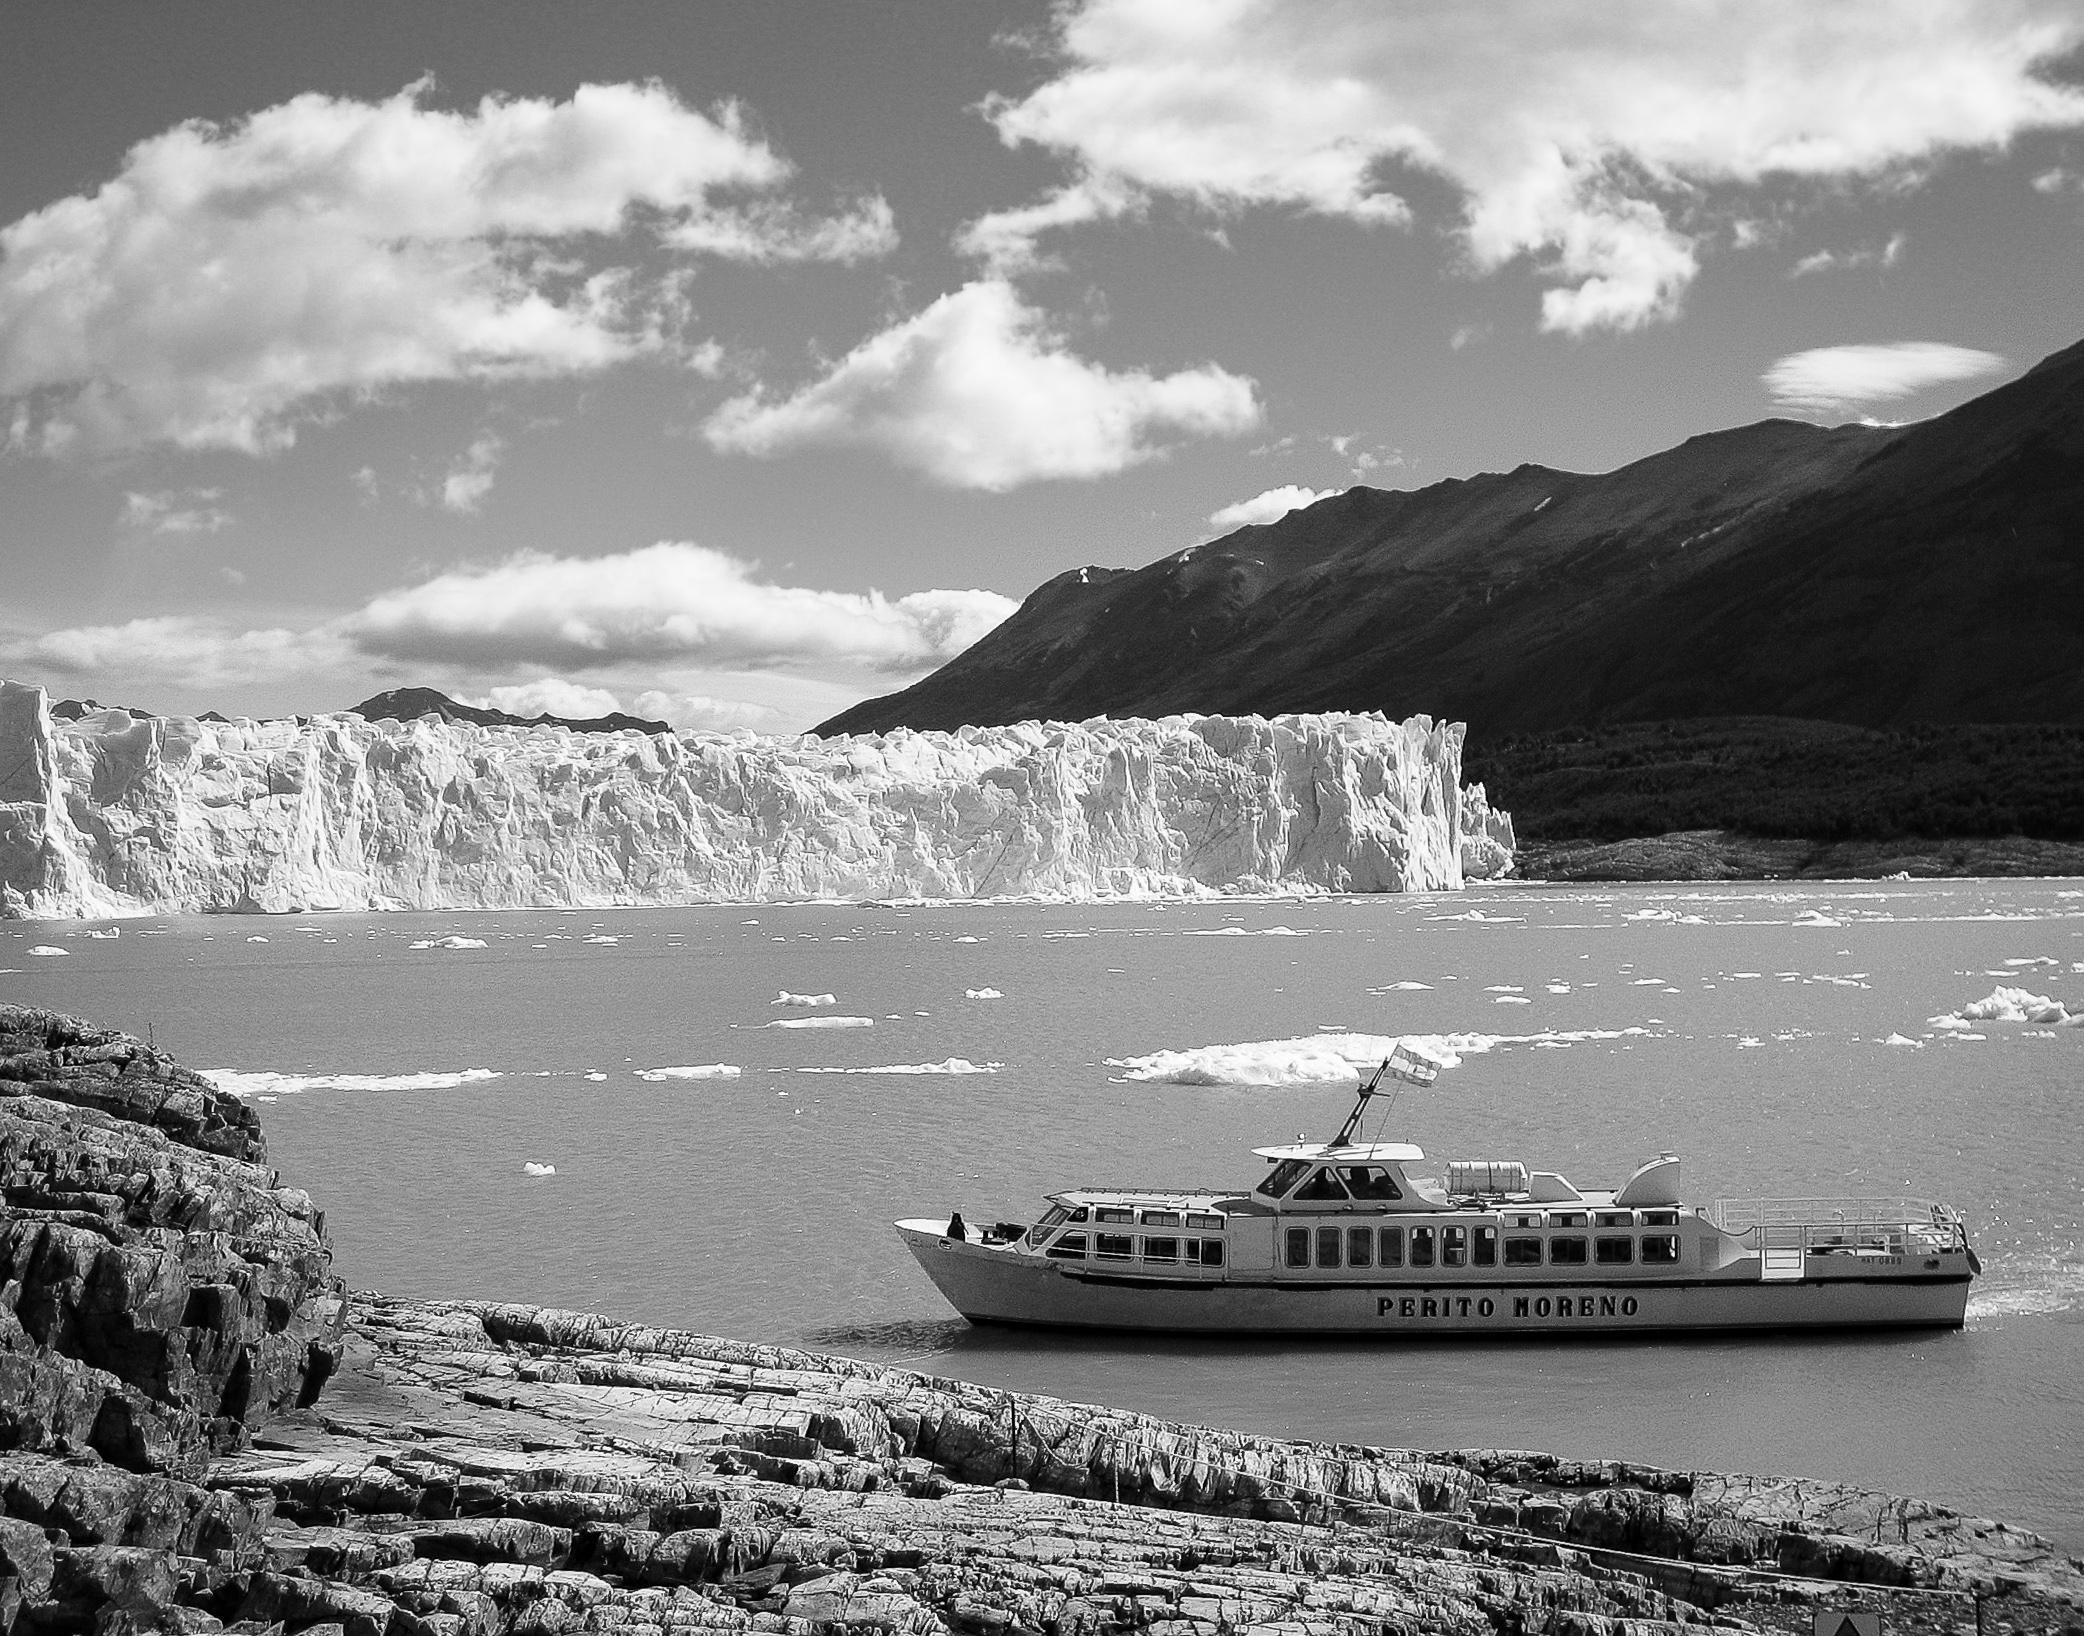 patagonia_el-calafate_glaciar-perito-moreno-2797-_boat-crossing.jpg